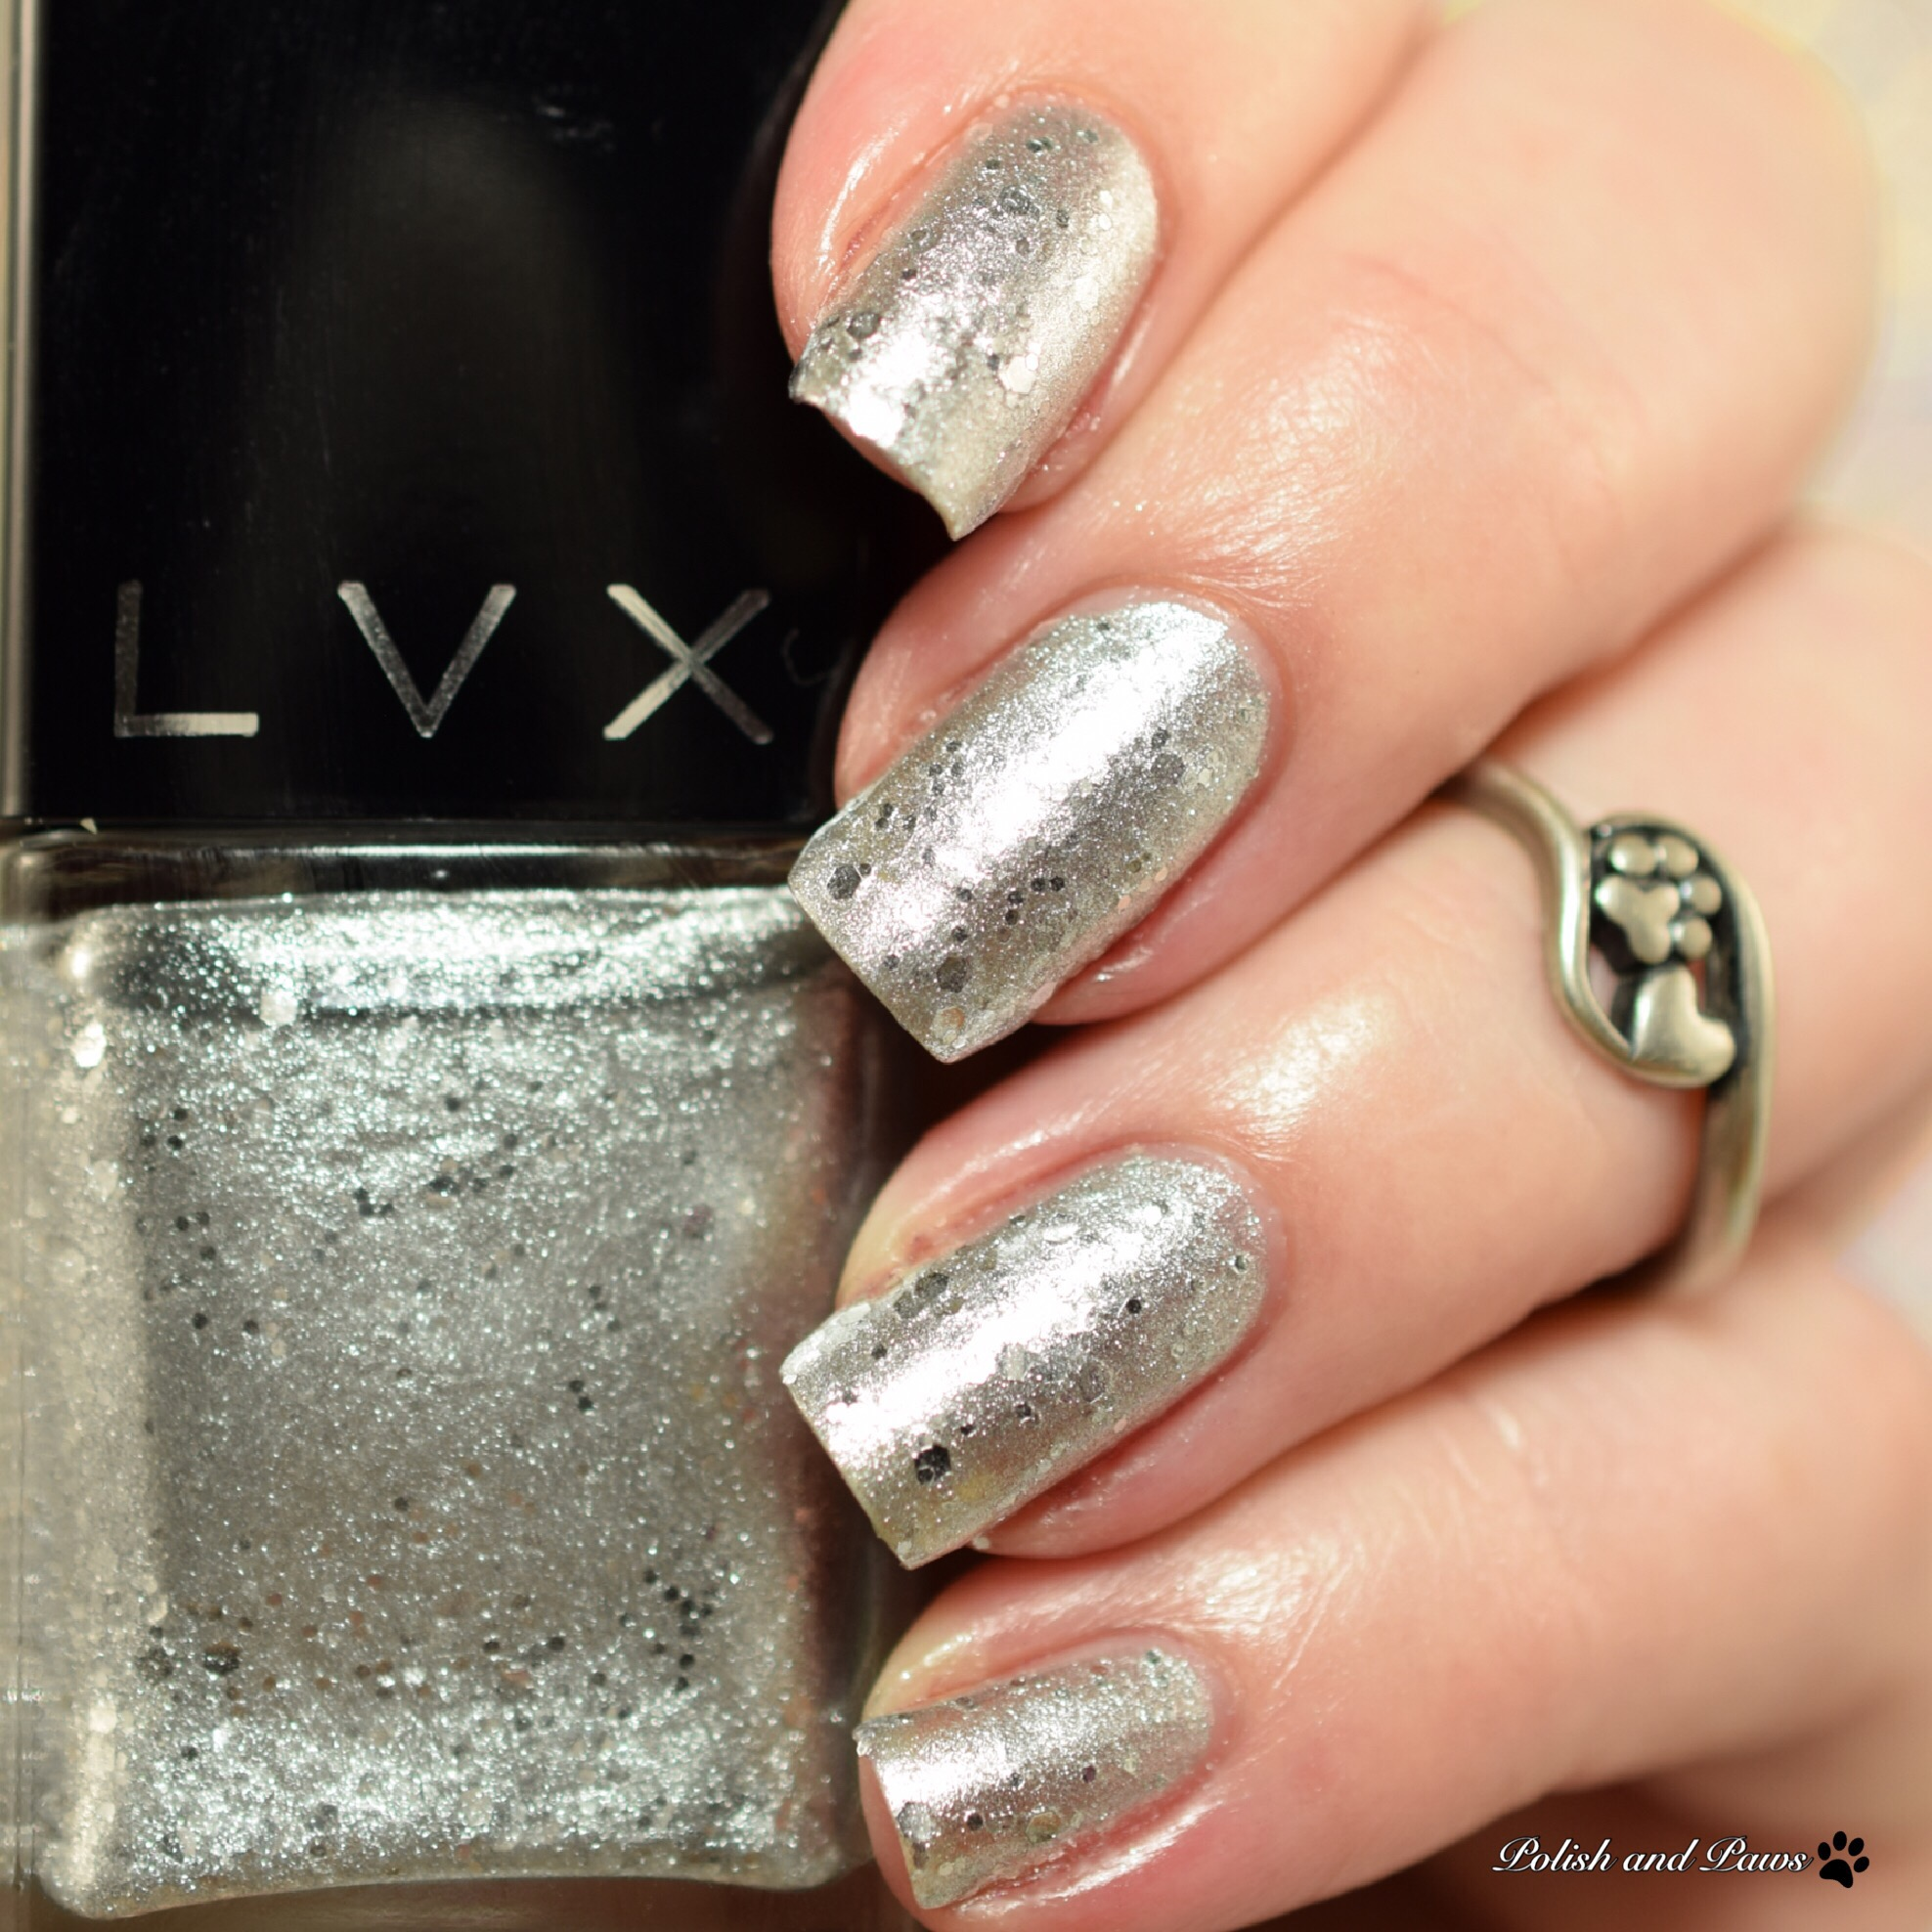 LVX Stardust